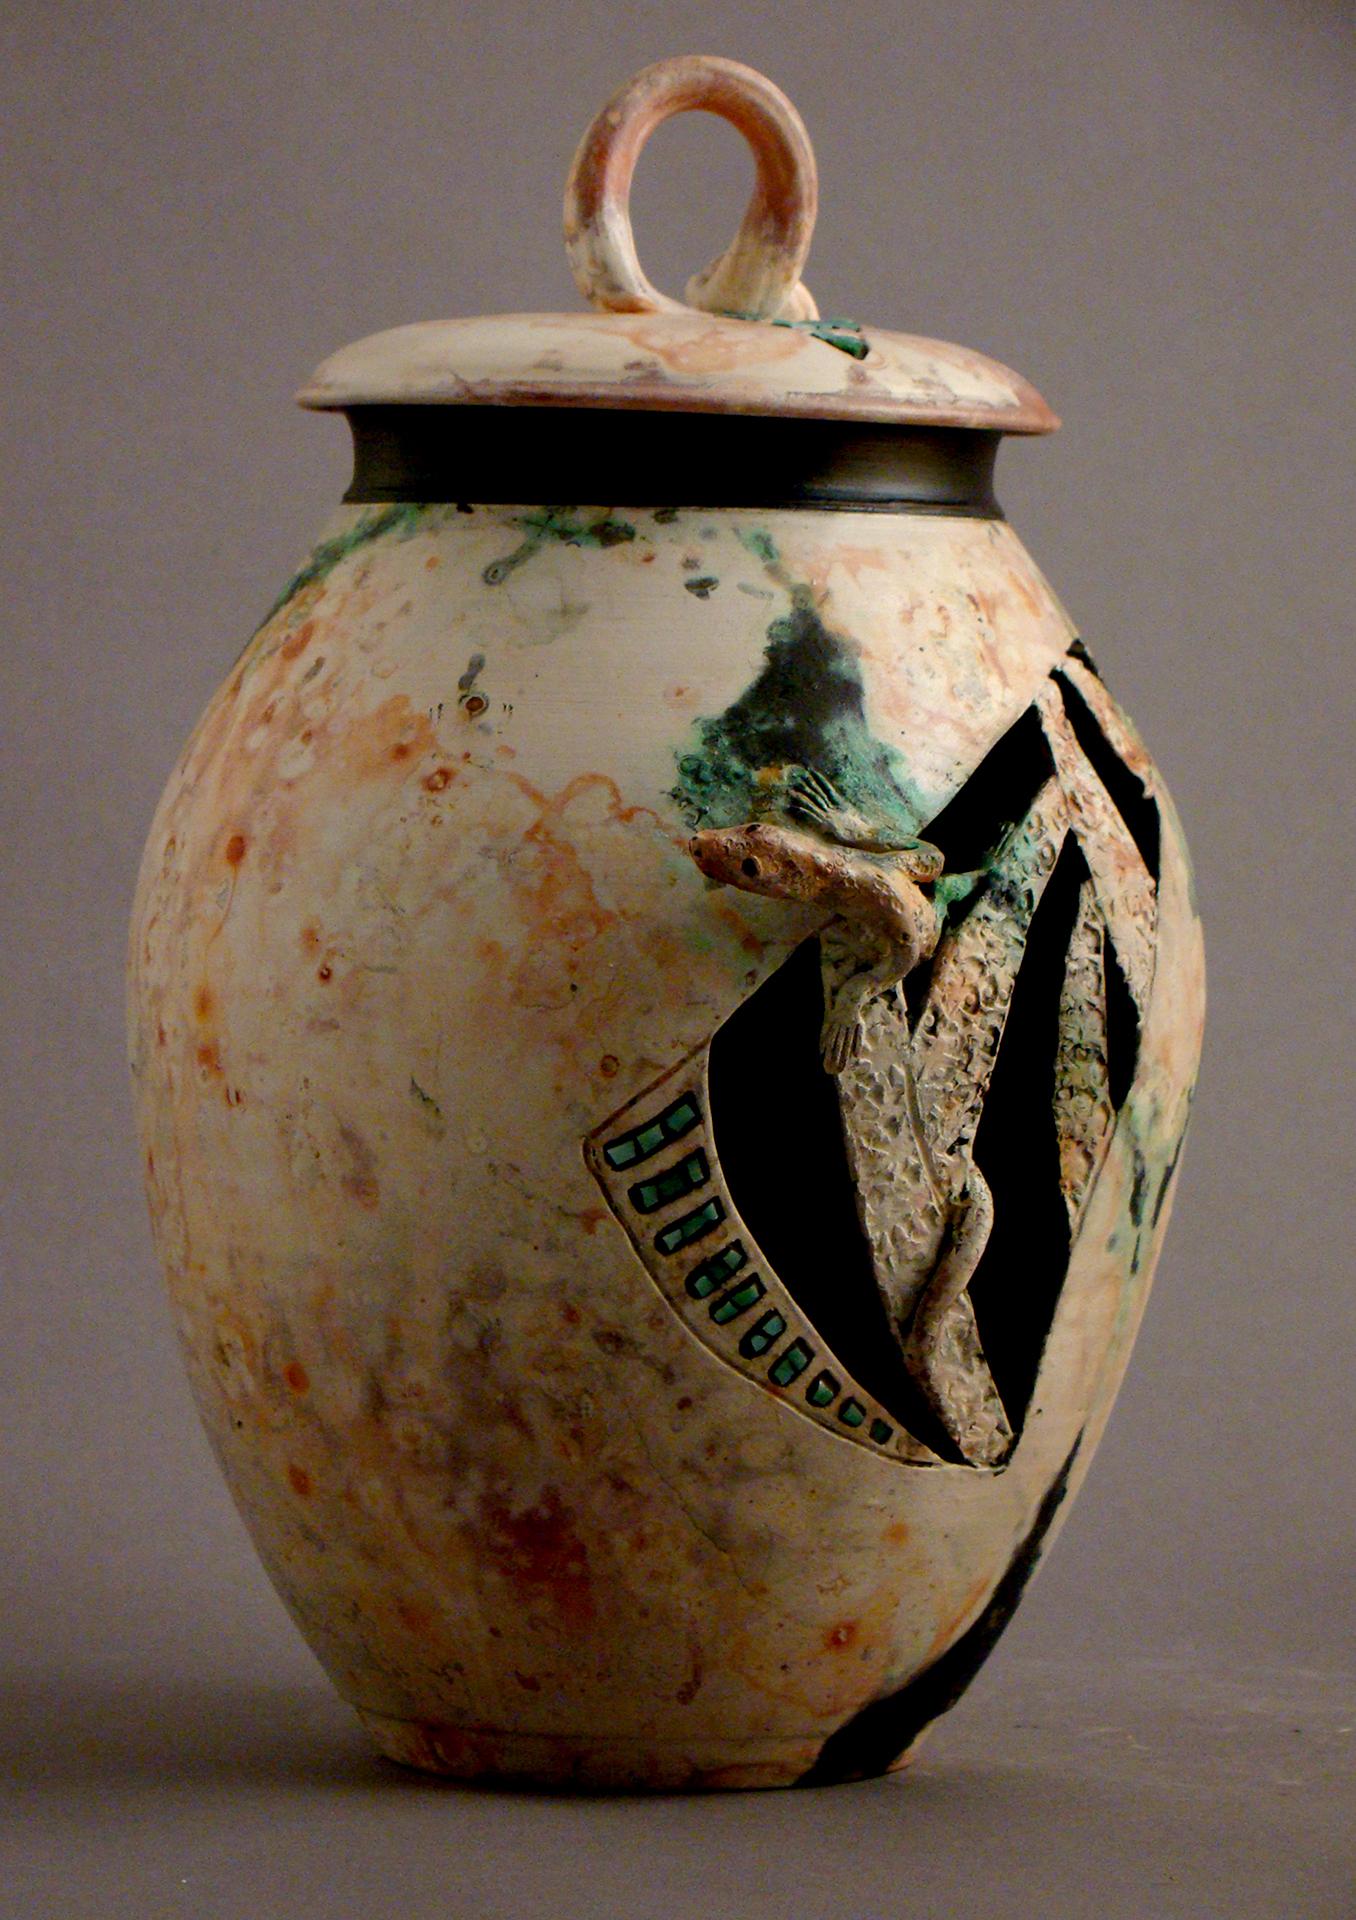 SaggarLizard Jar with mosaic and green flashing